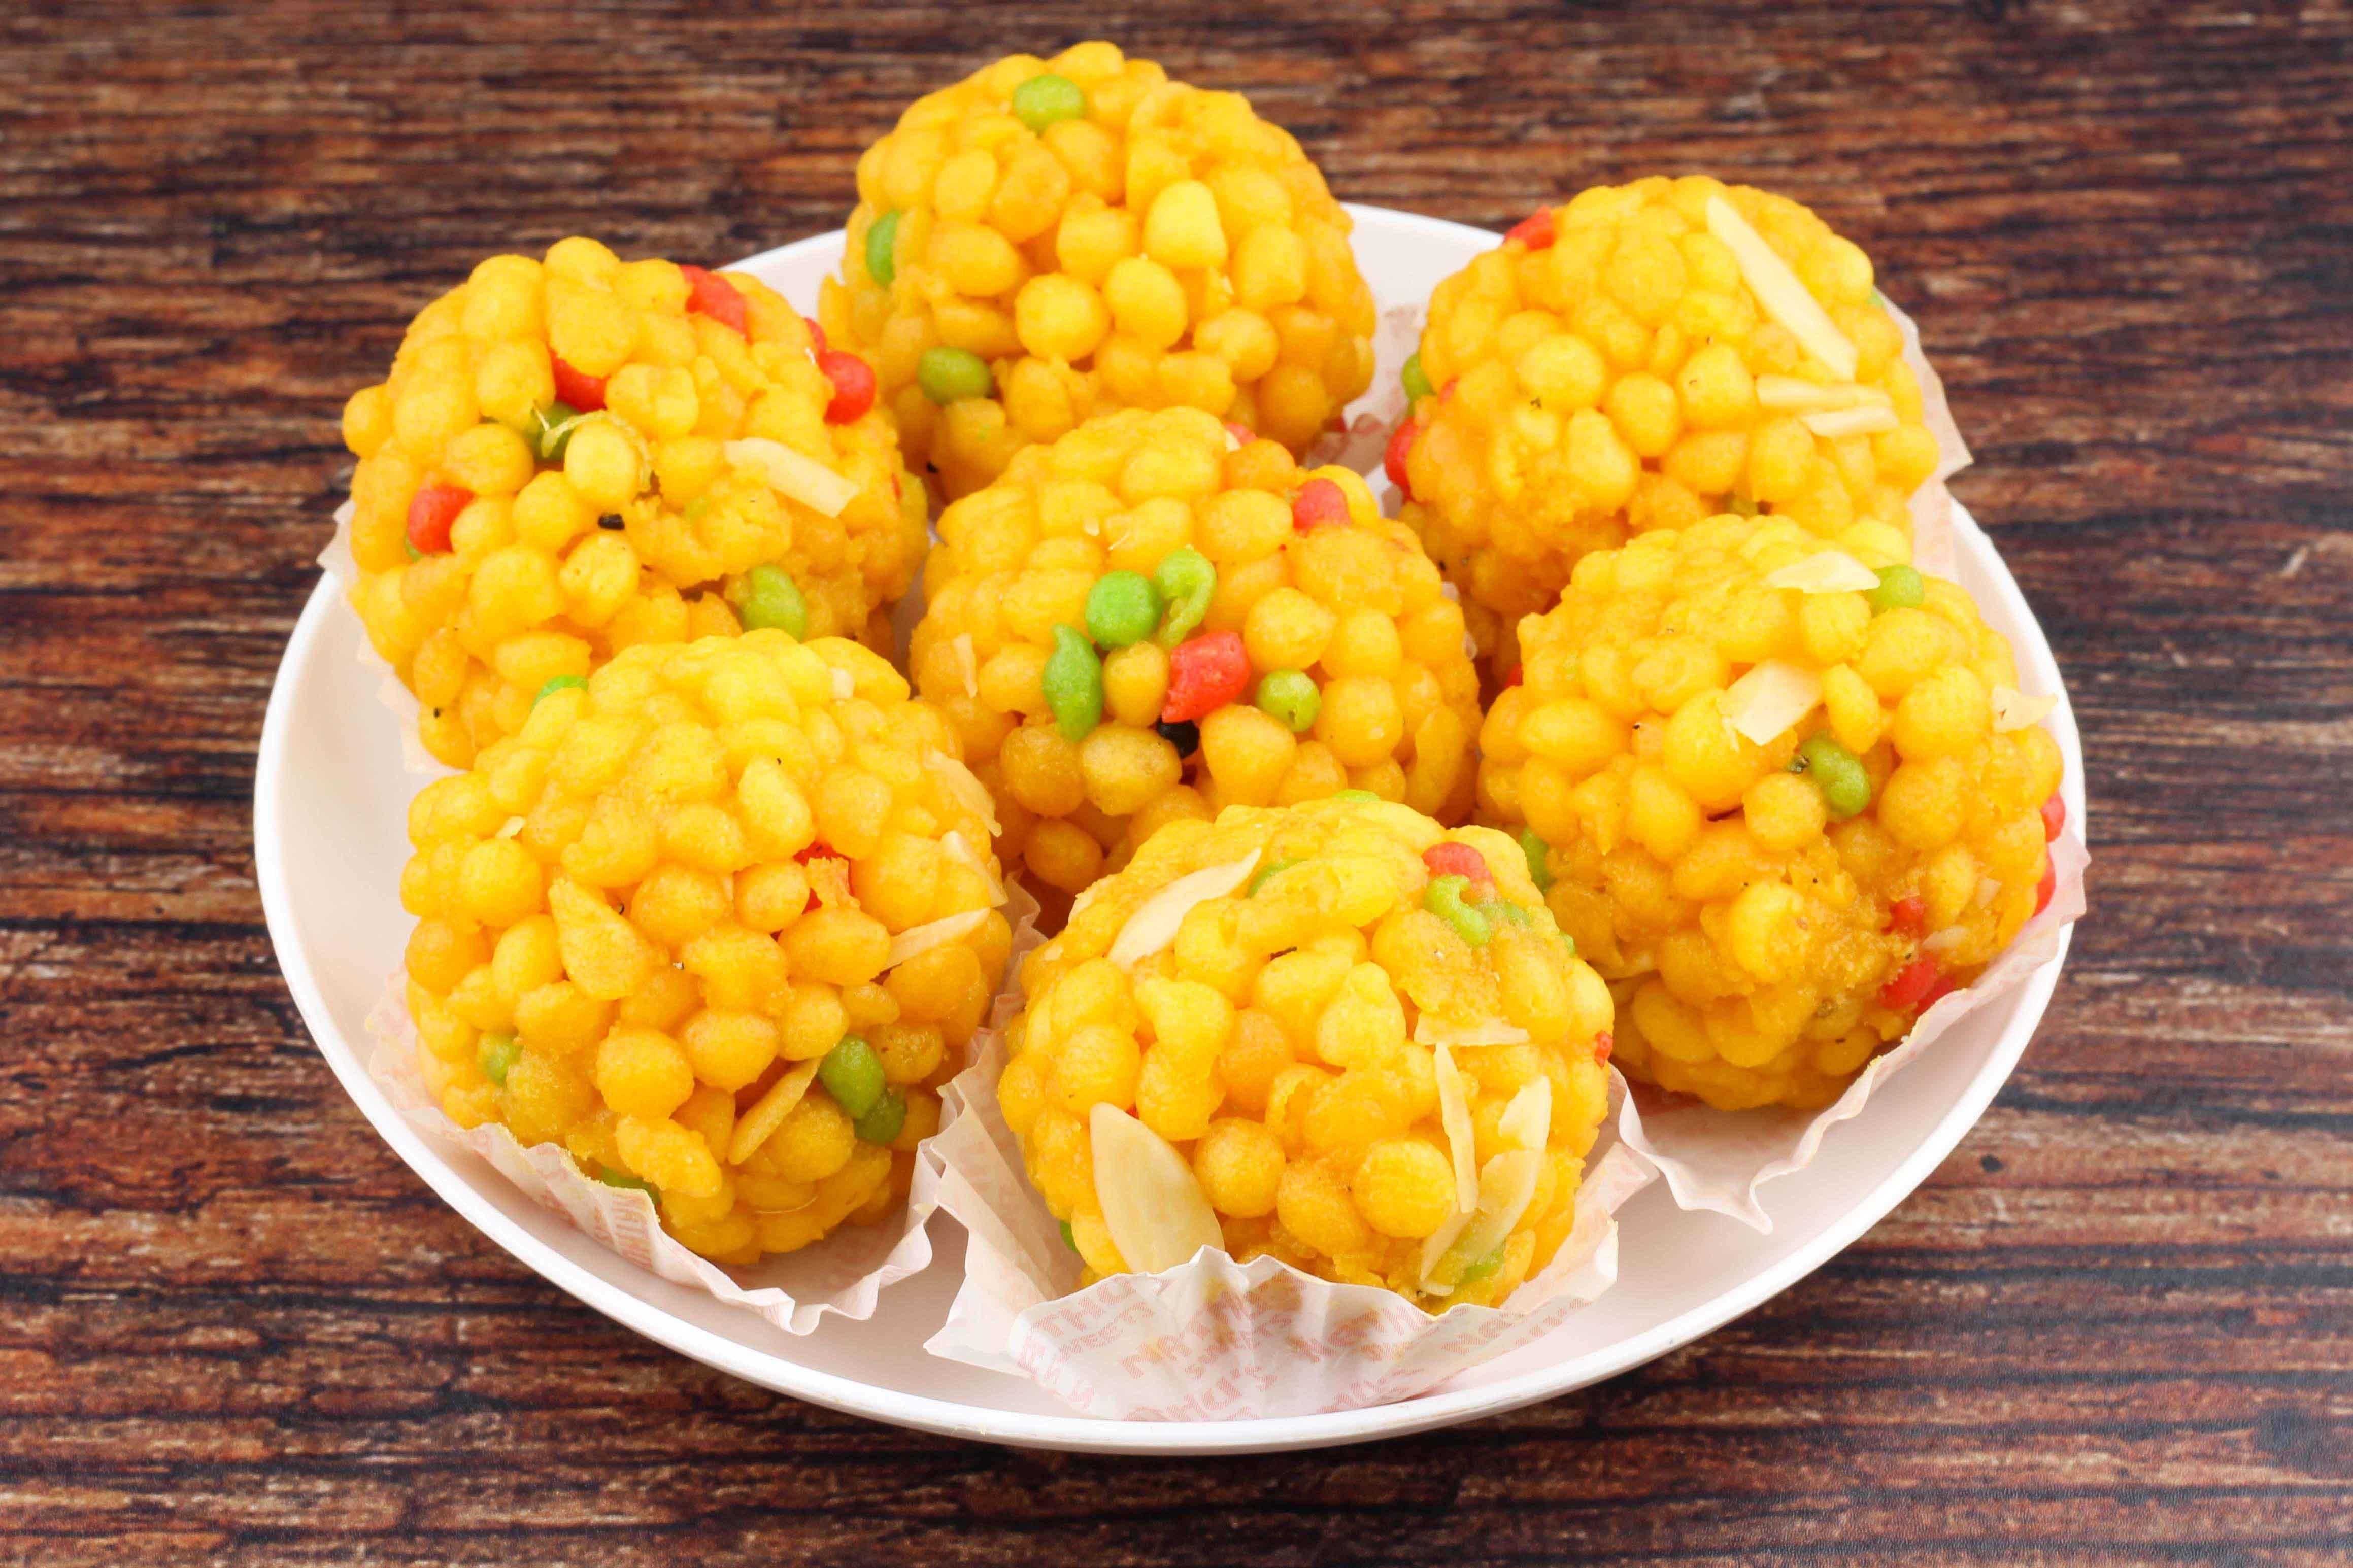 New Shiva Sweets - Sector 35C - Chandigarh Image